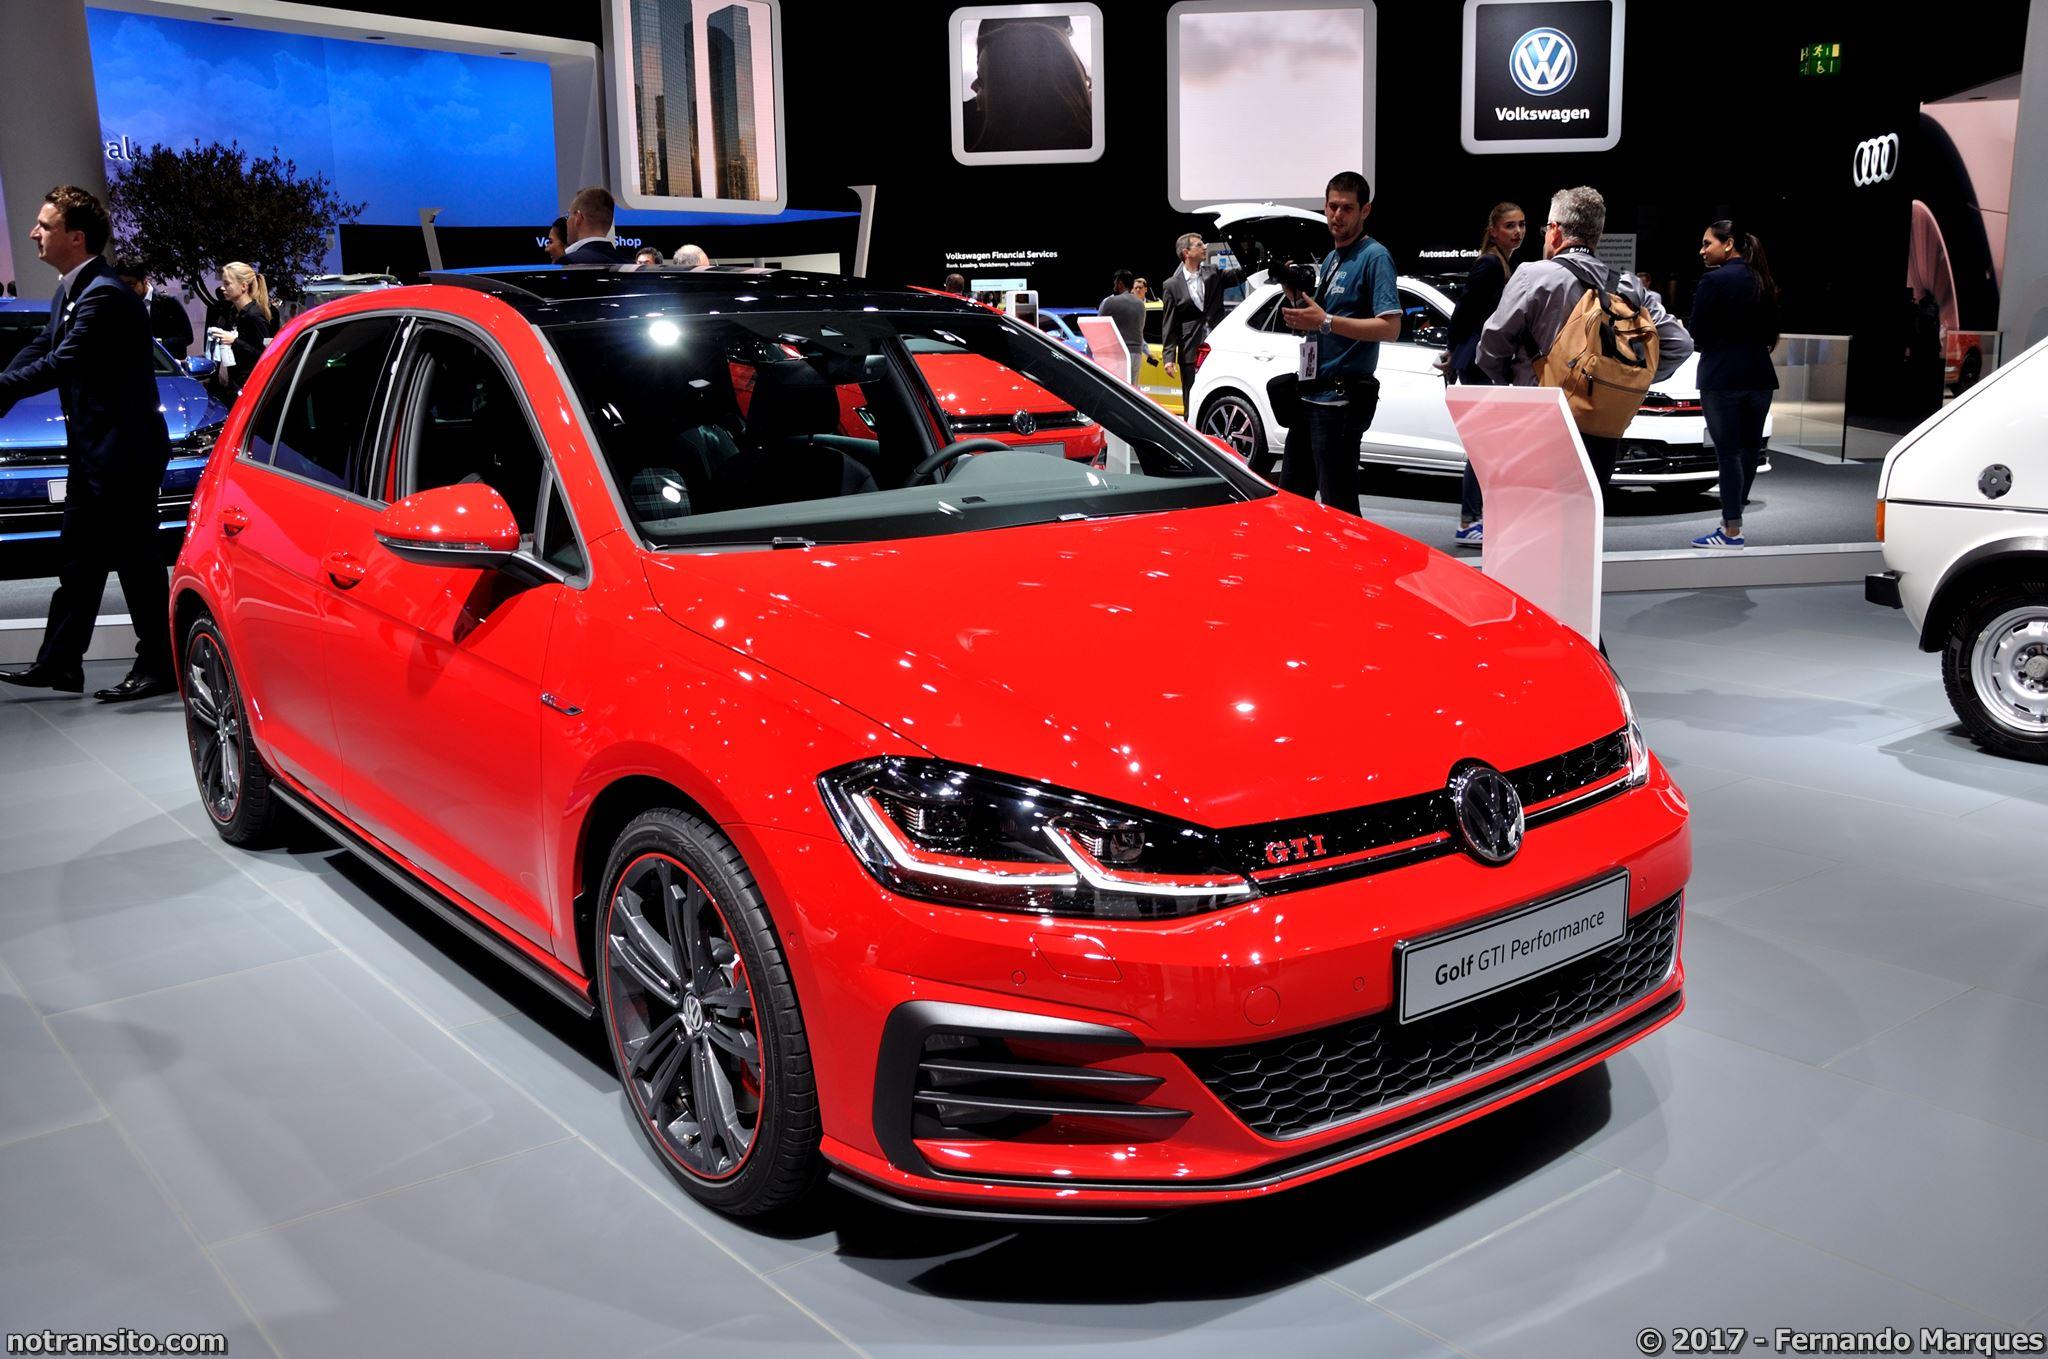 Volkswagen-Golf-GTI-Frankfurt-2017-014